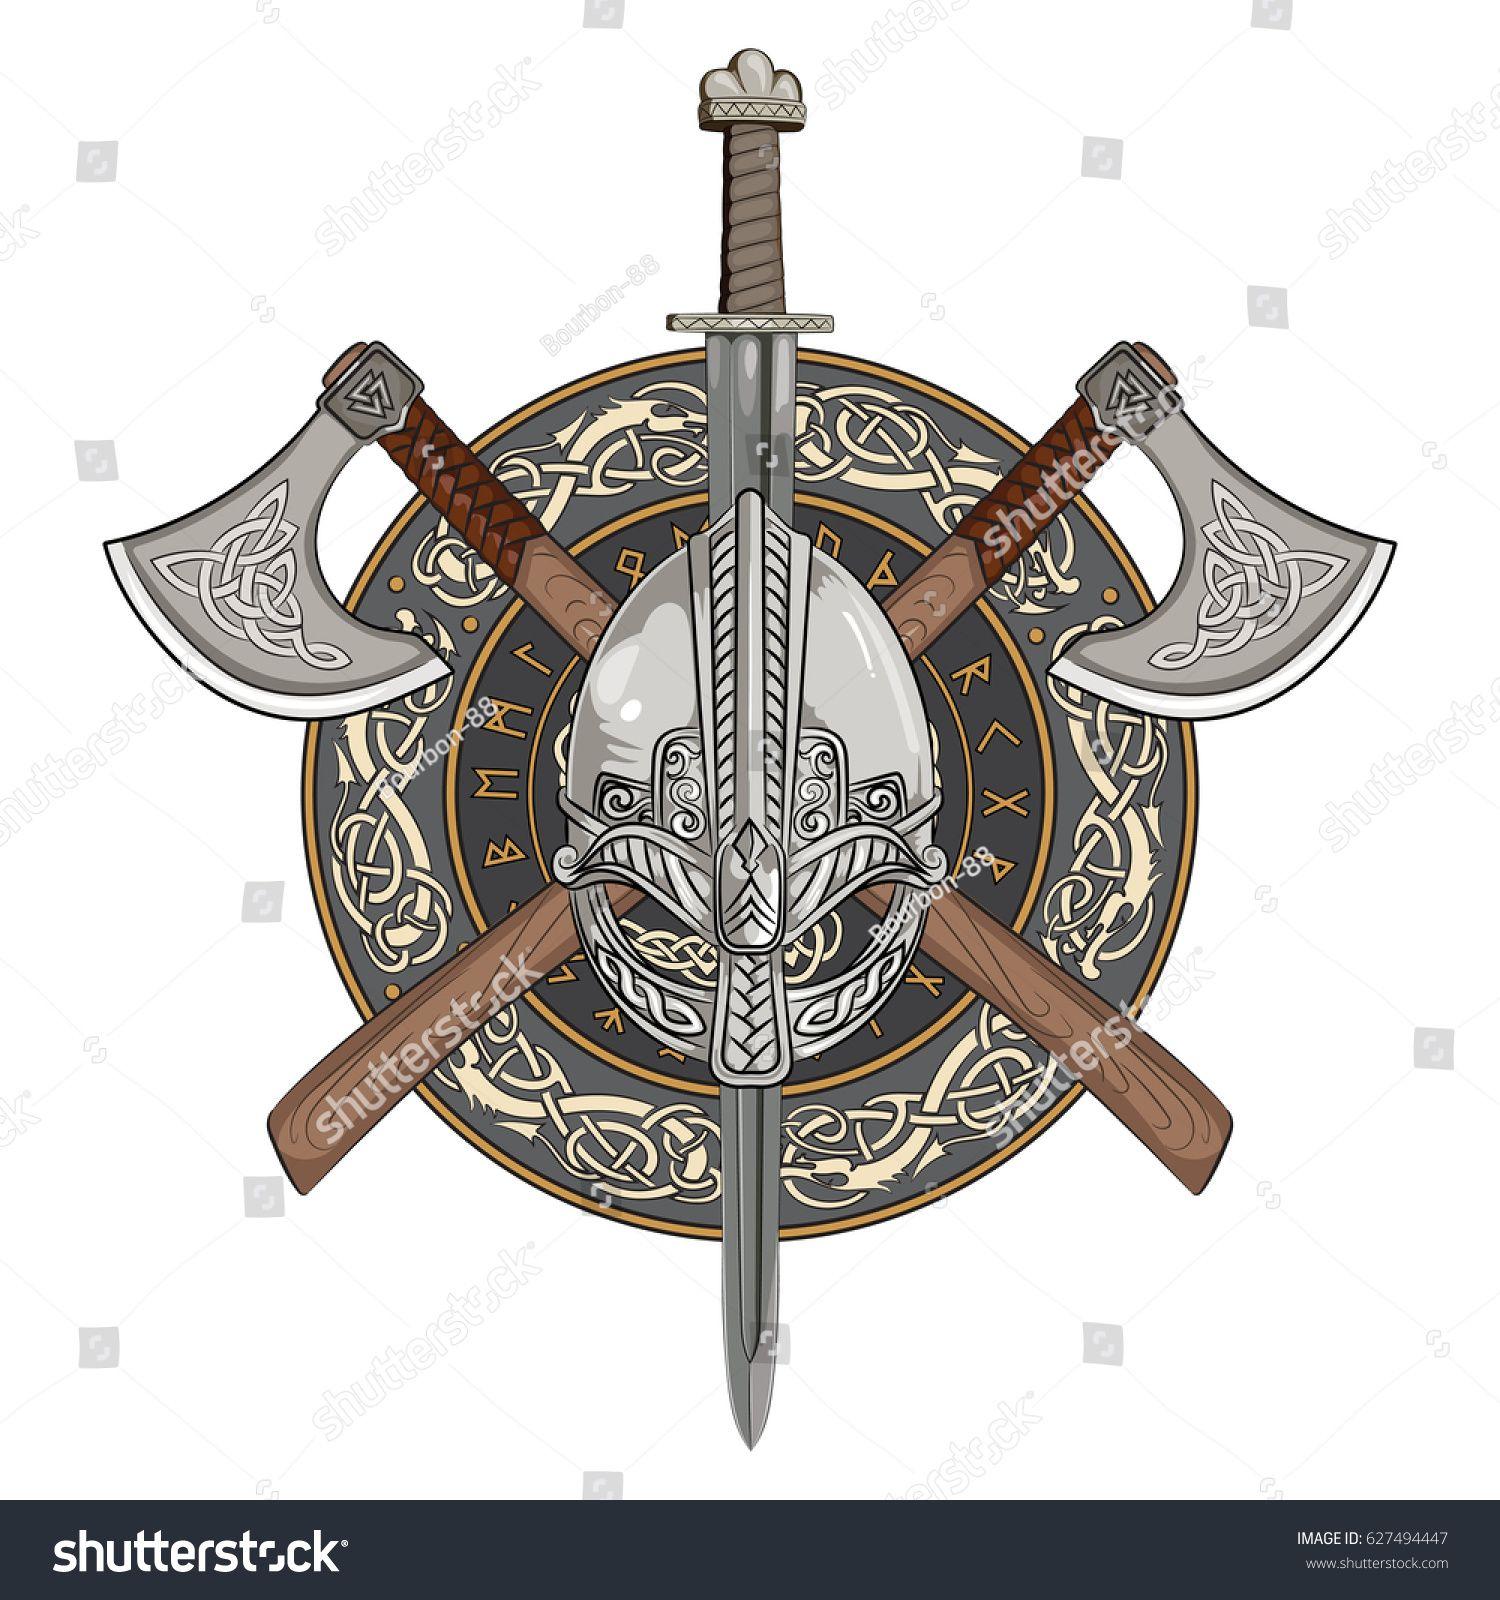 1500x1600 Viking Helmet, Crossed Viking Axes And In A Wreath Of Scandinavian